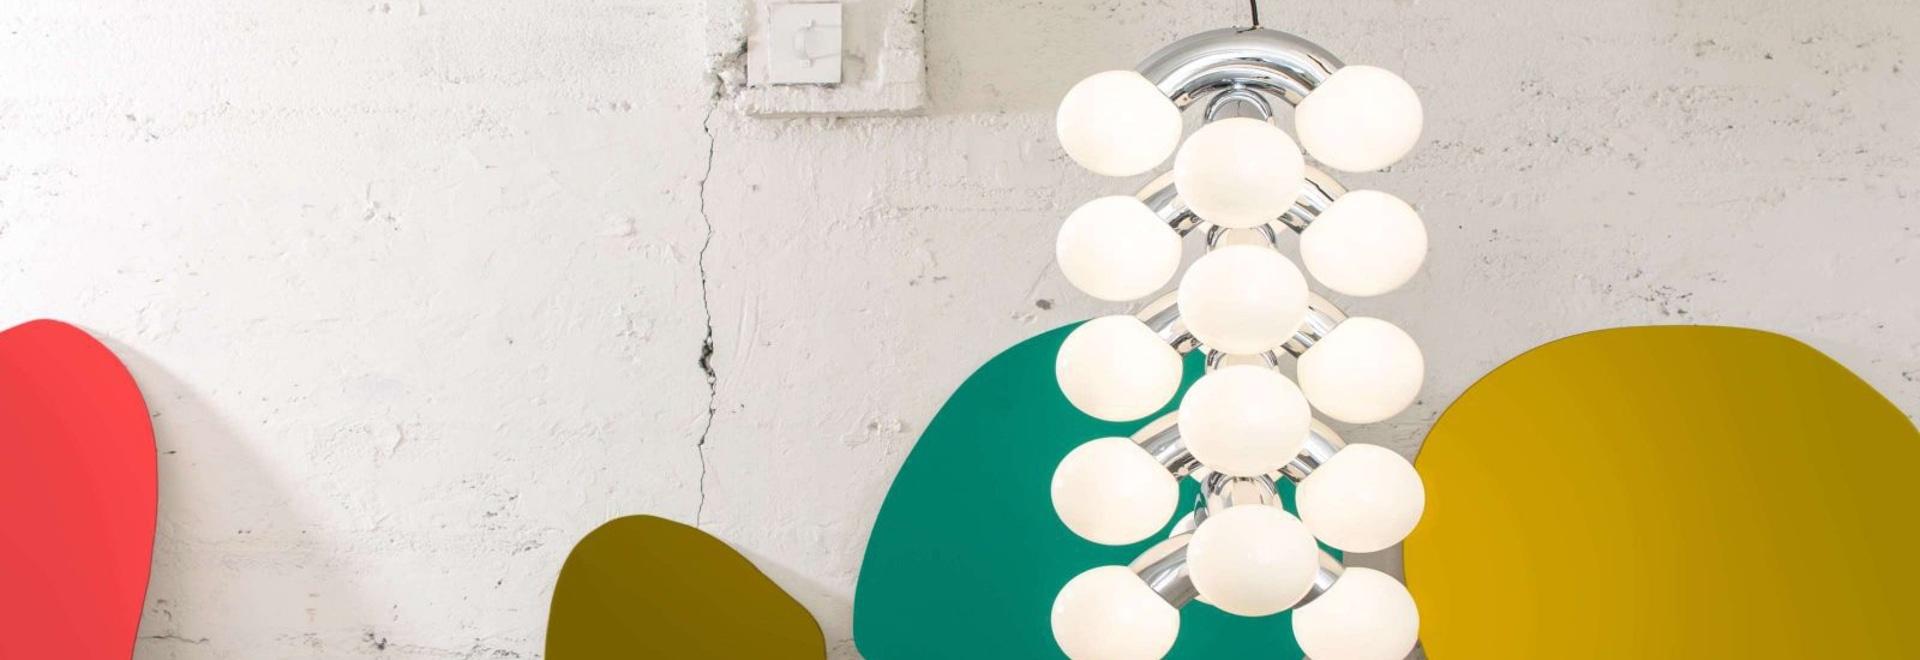 Caine Heintzman Has Designed The VINE Pendant Light